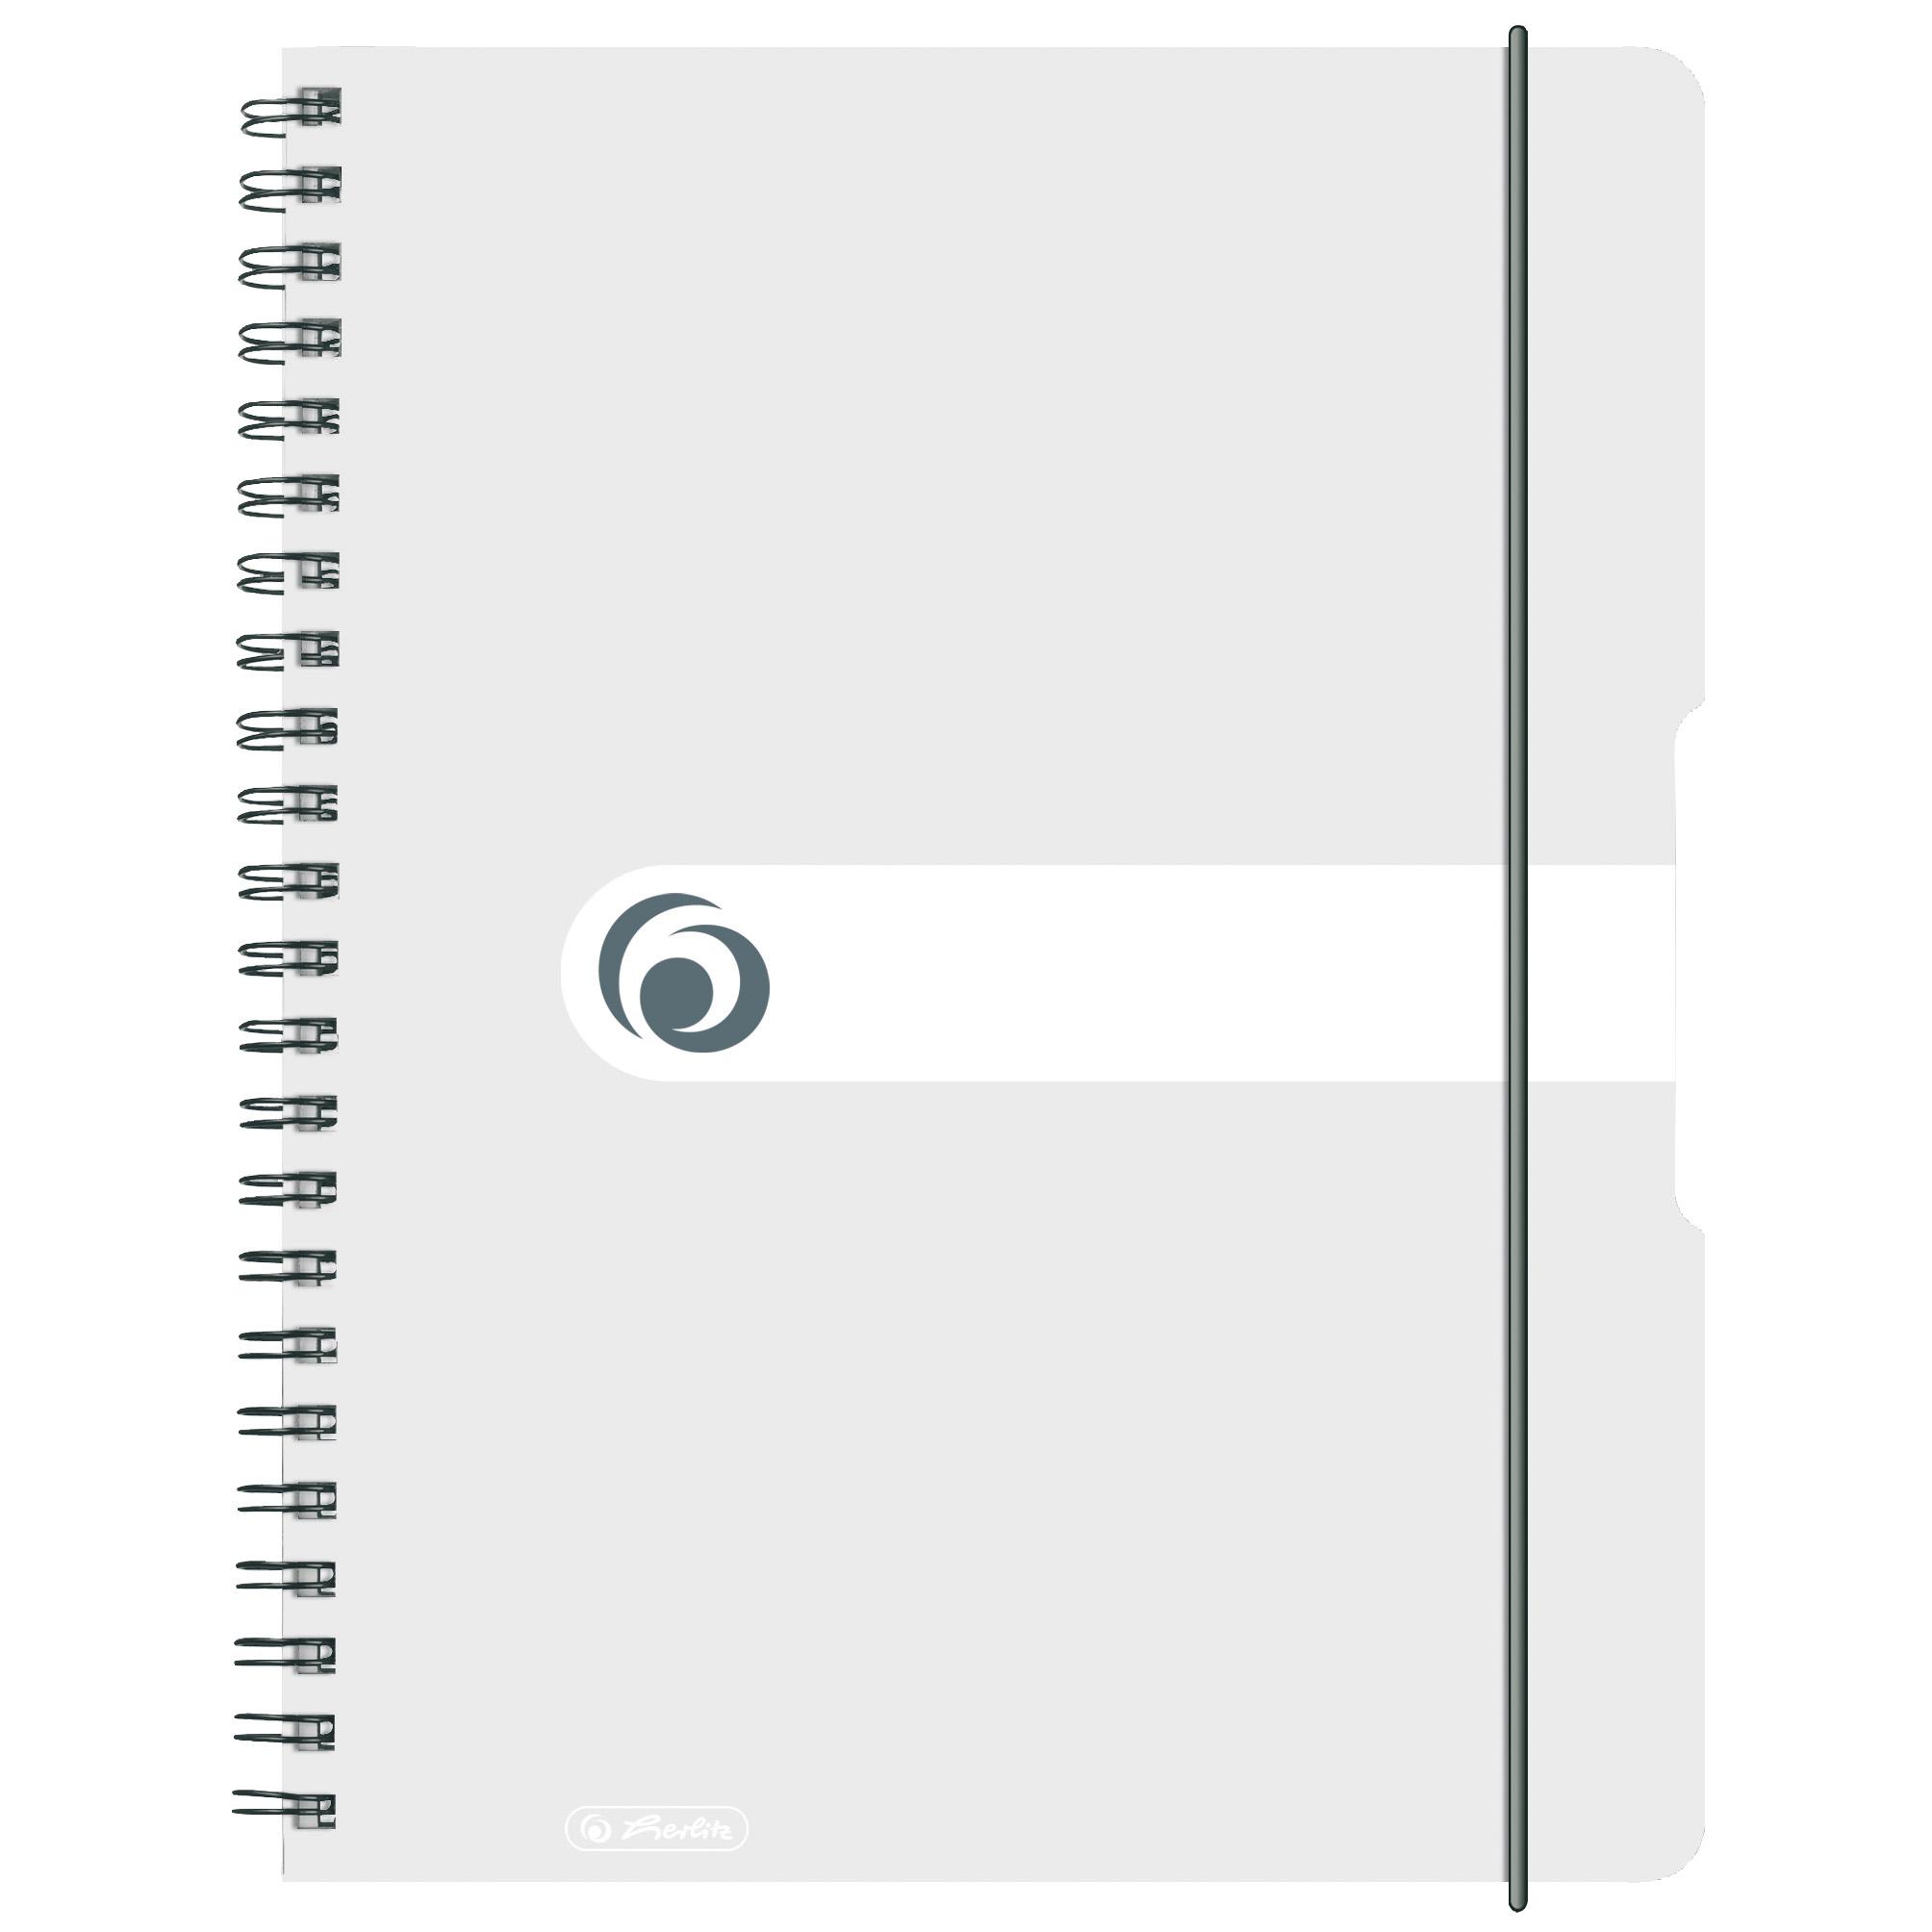 Spiralblock DIN A4 5x Herlitz Collegeblock kariert 80 Blatt